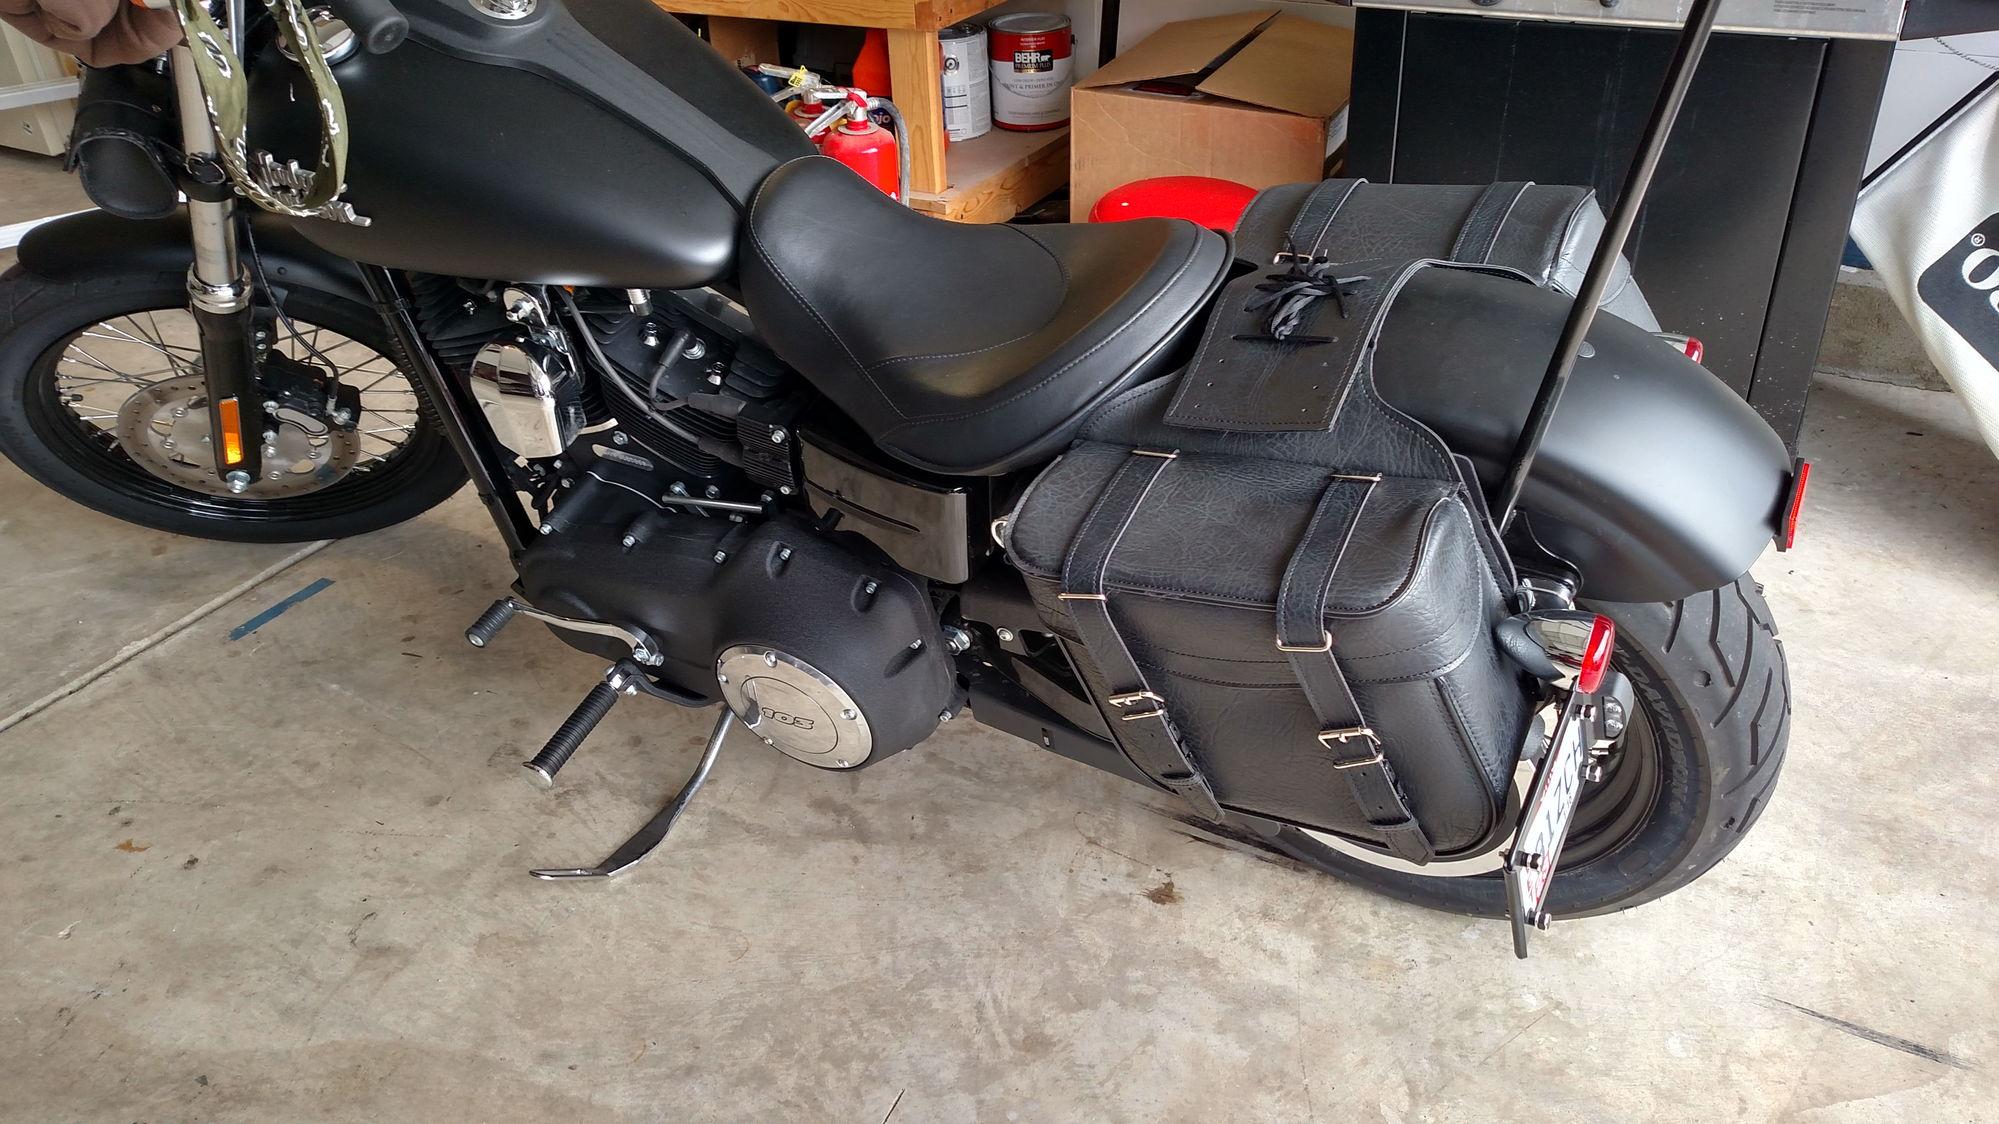 15 Street Bob Saddlebags Finally Harley Davidson Forums